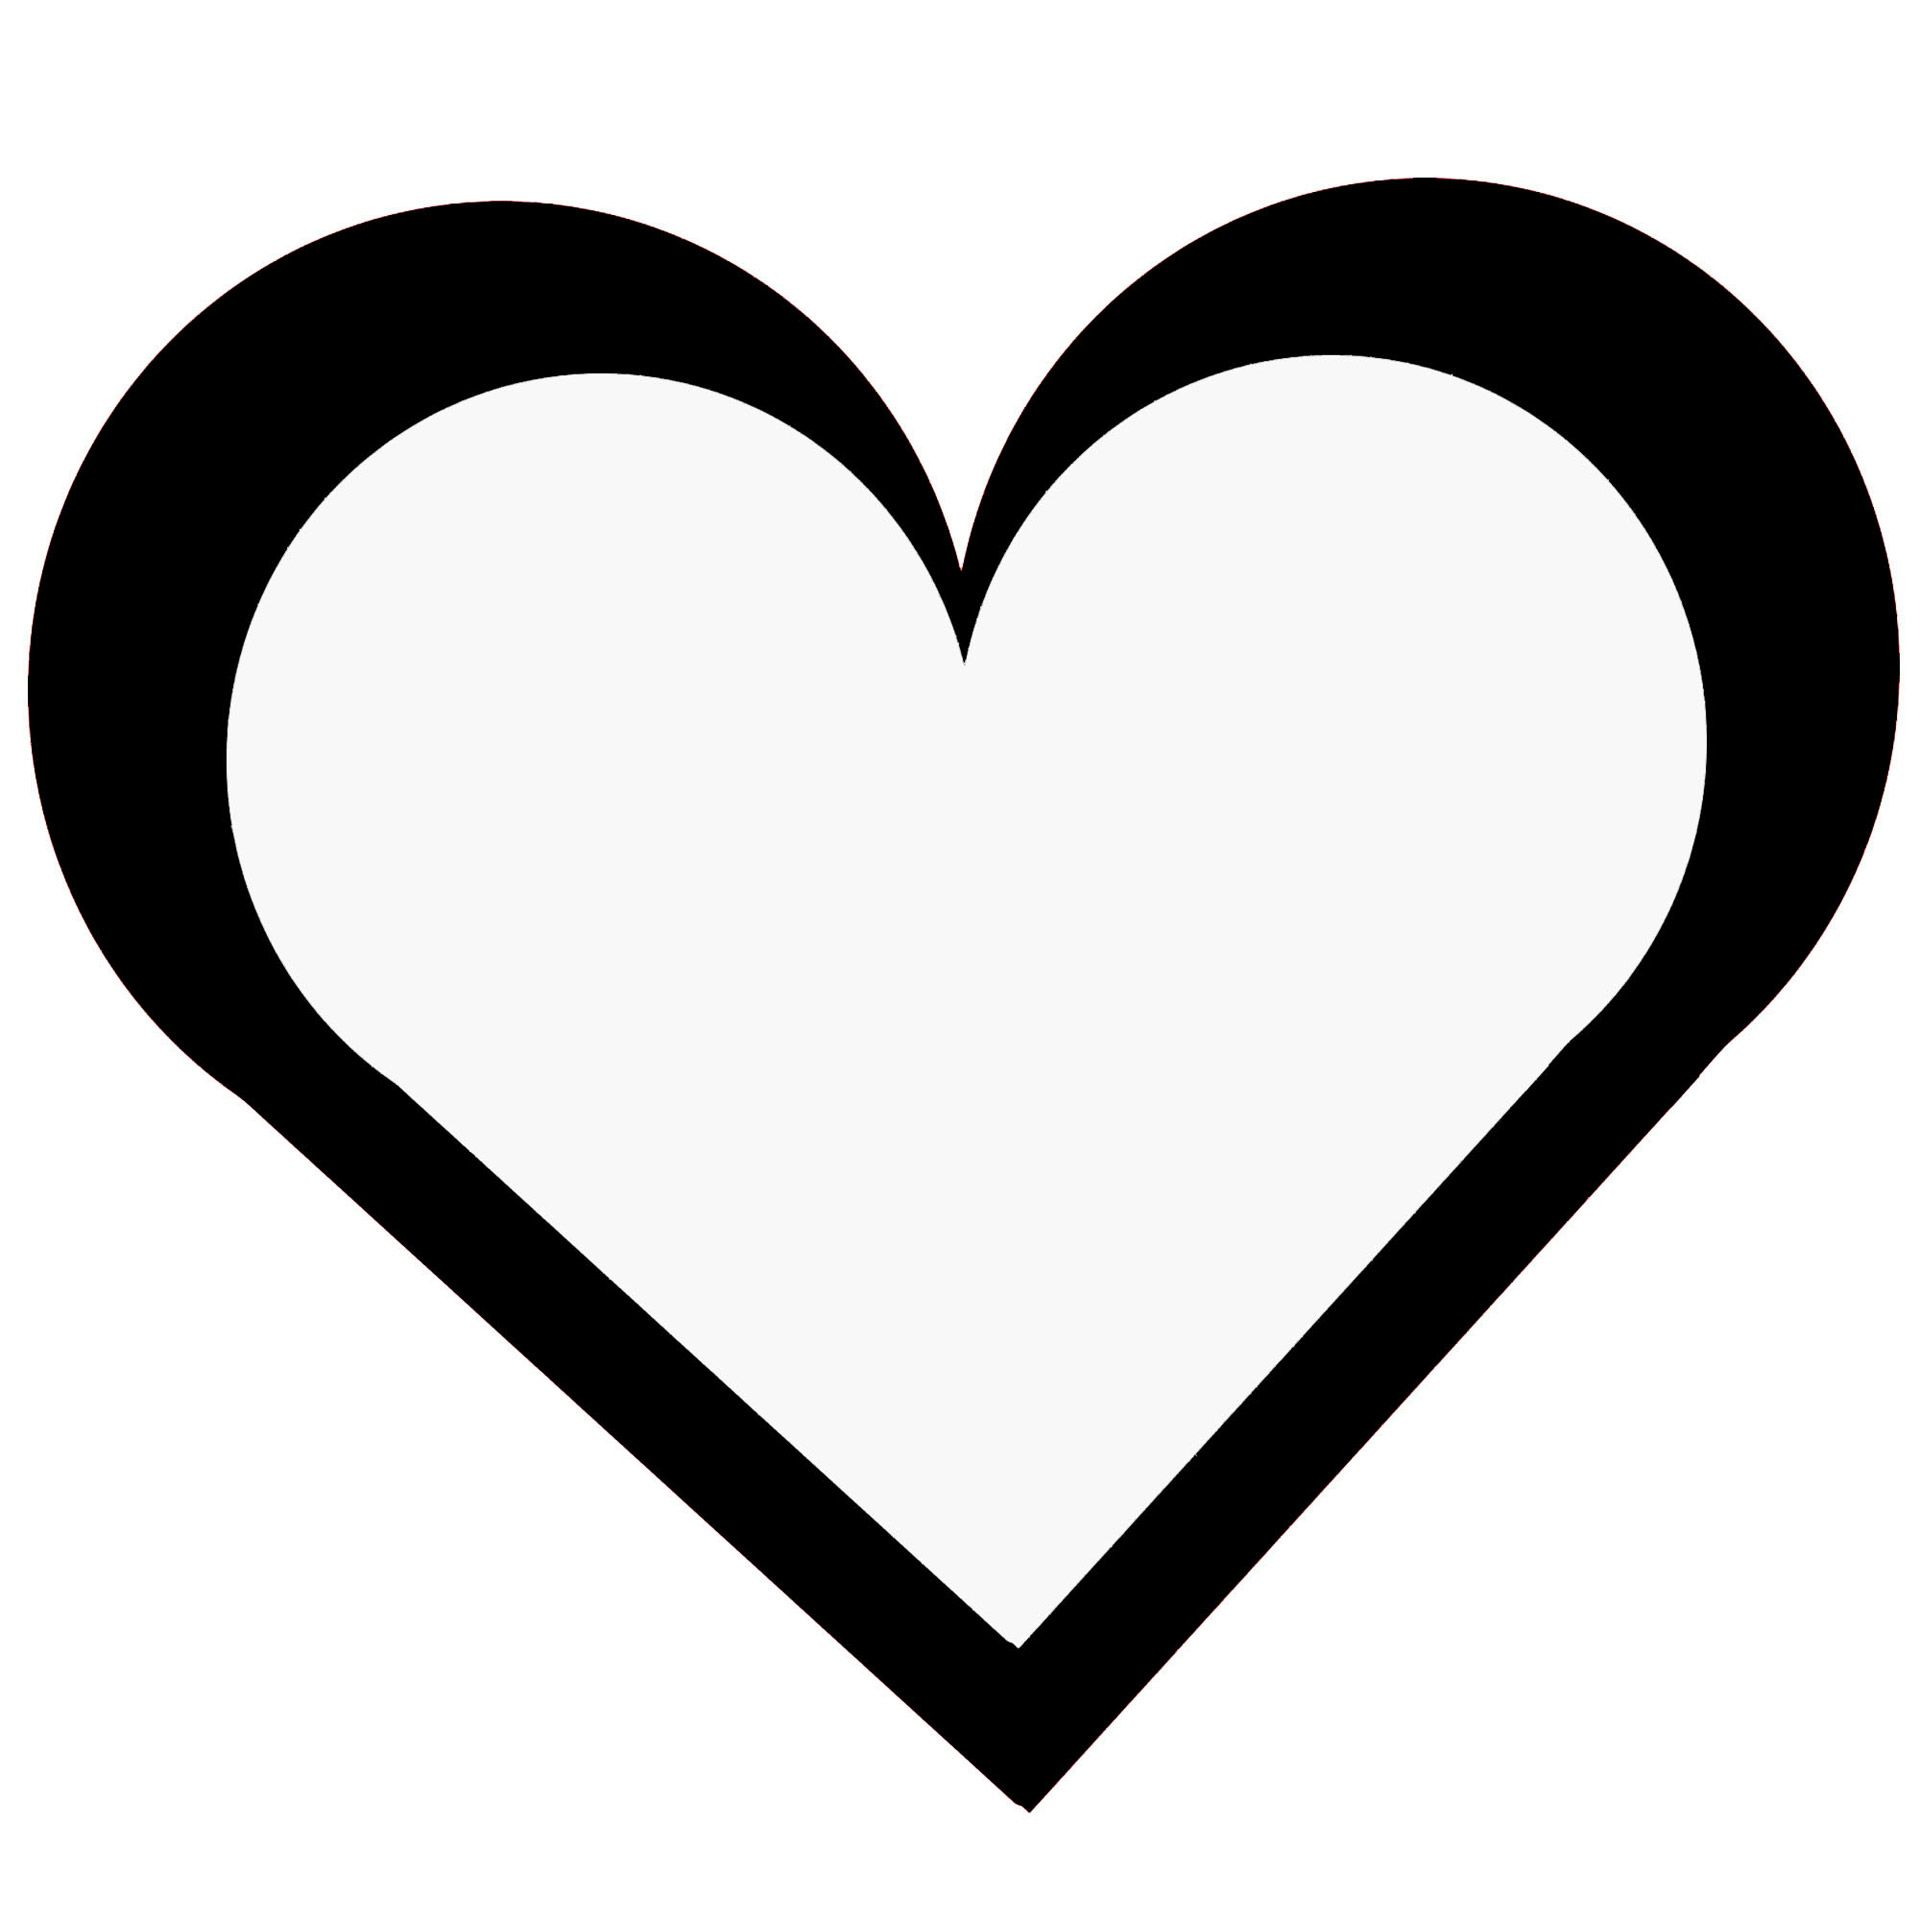 transparent black heart - HD1920×1920